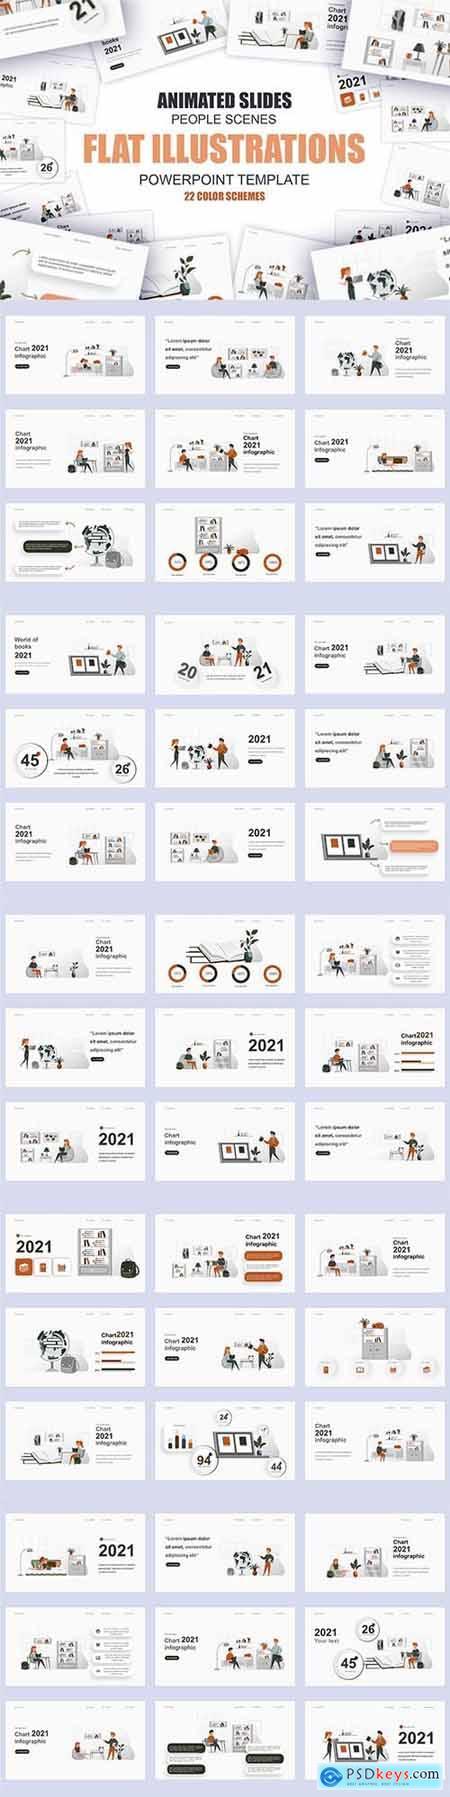 Education Illustration Powerpoint Template